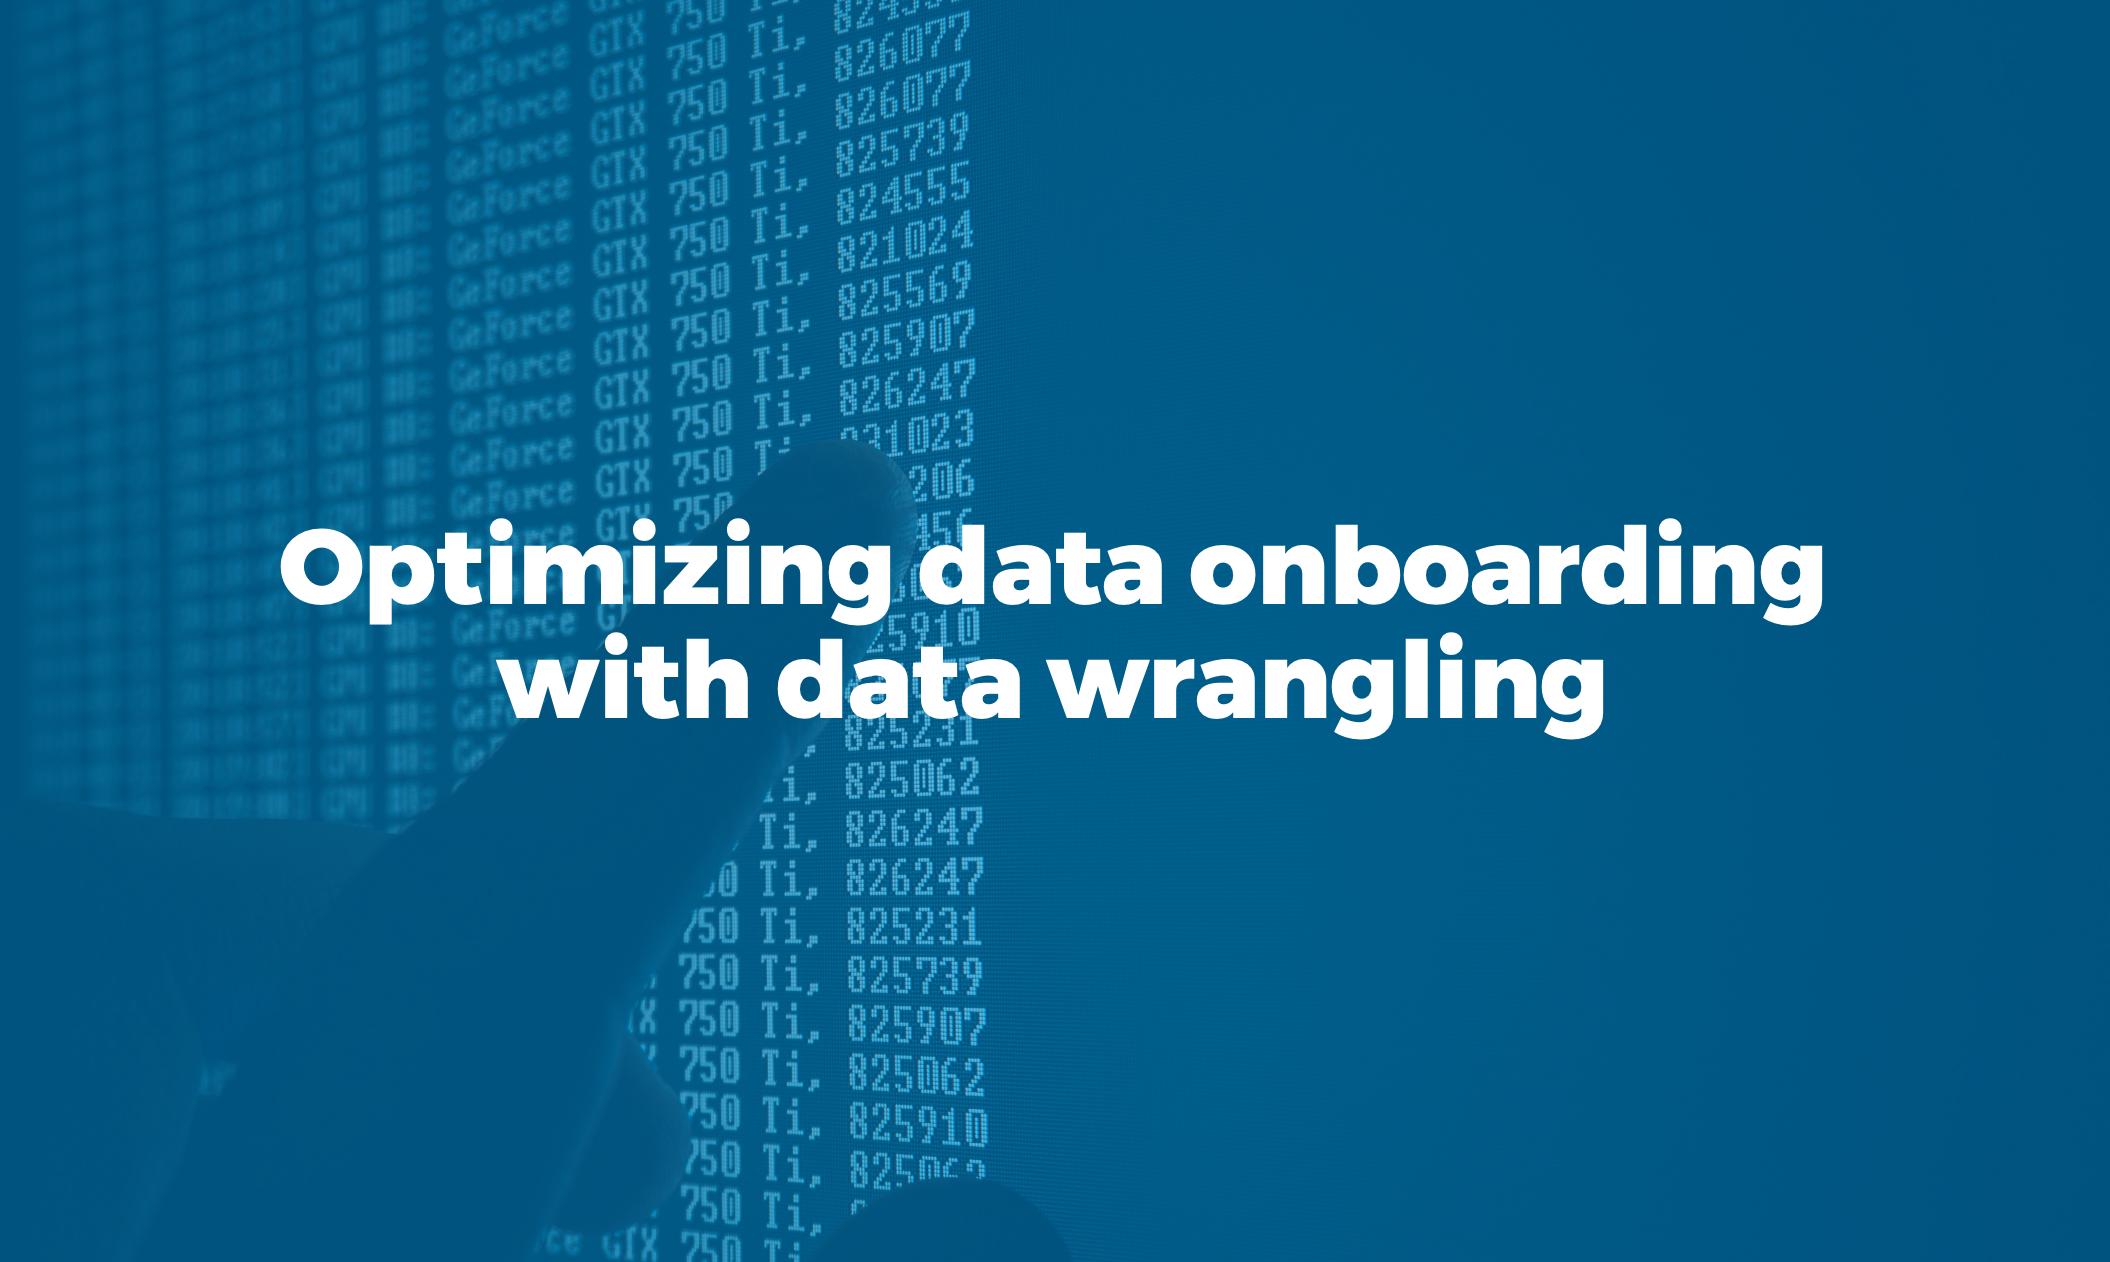 Bismart BI optimizing data onboarding with data wrangling in azure